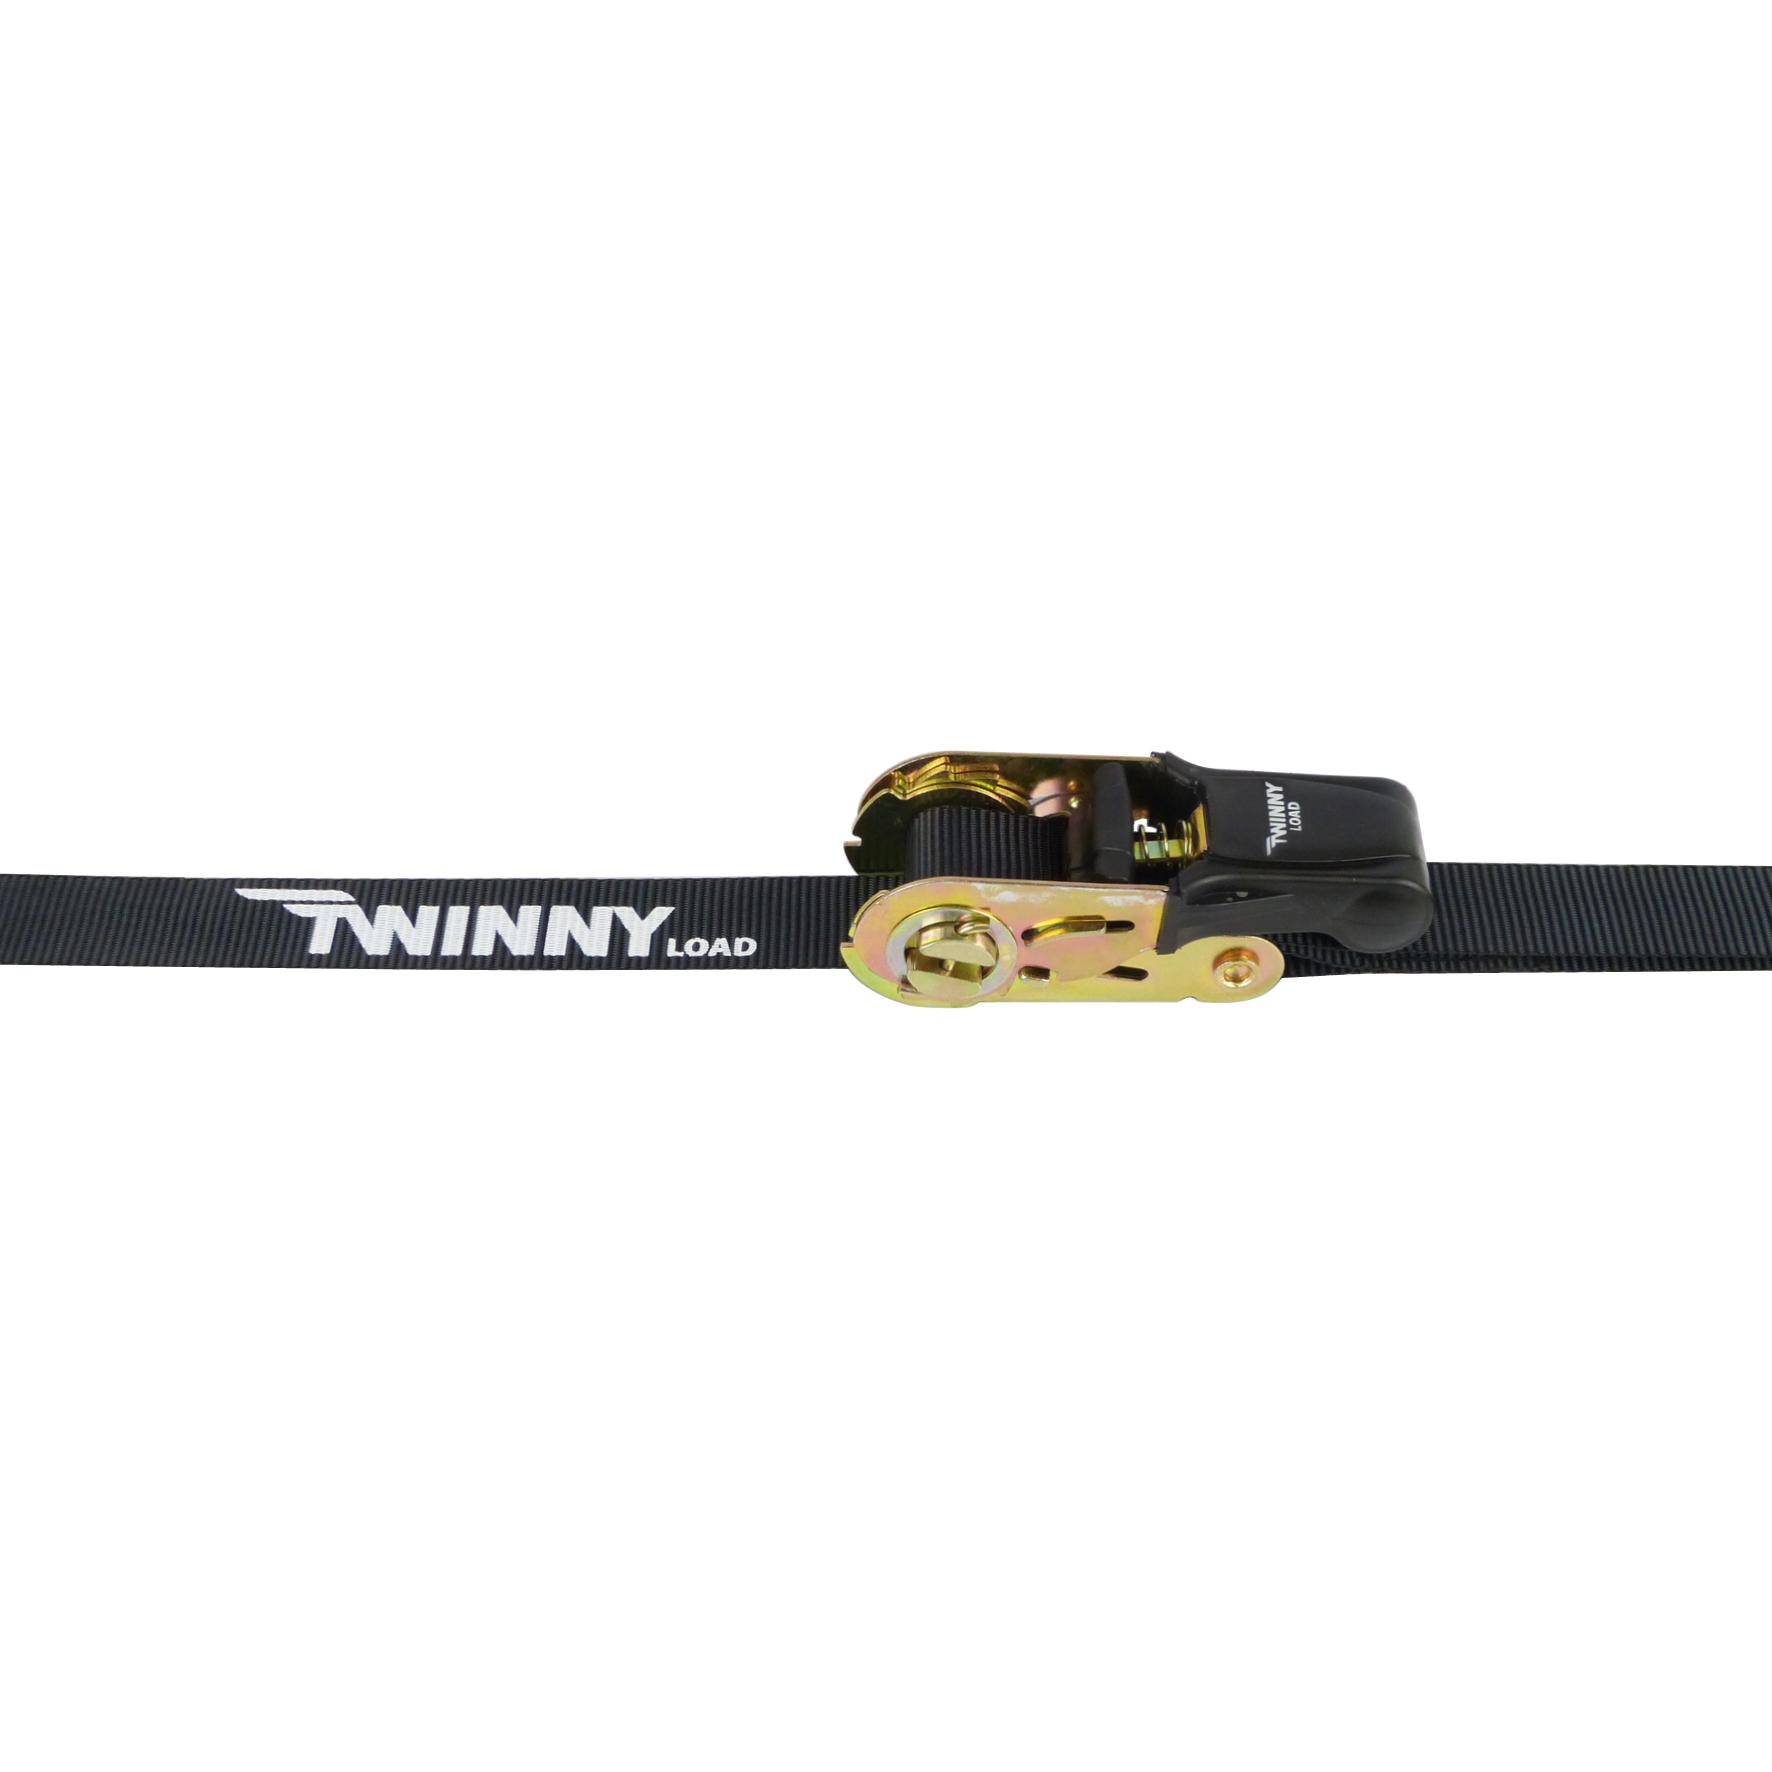 Twinny Load 627998026 Spanband met haak 25mm x 5m